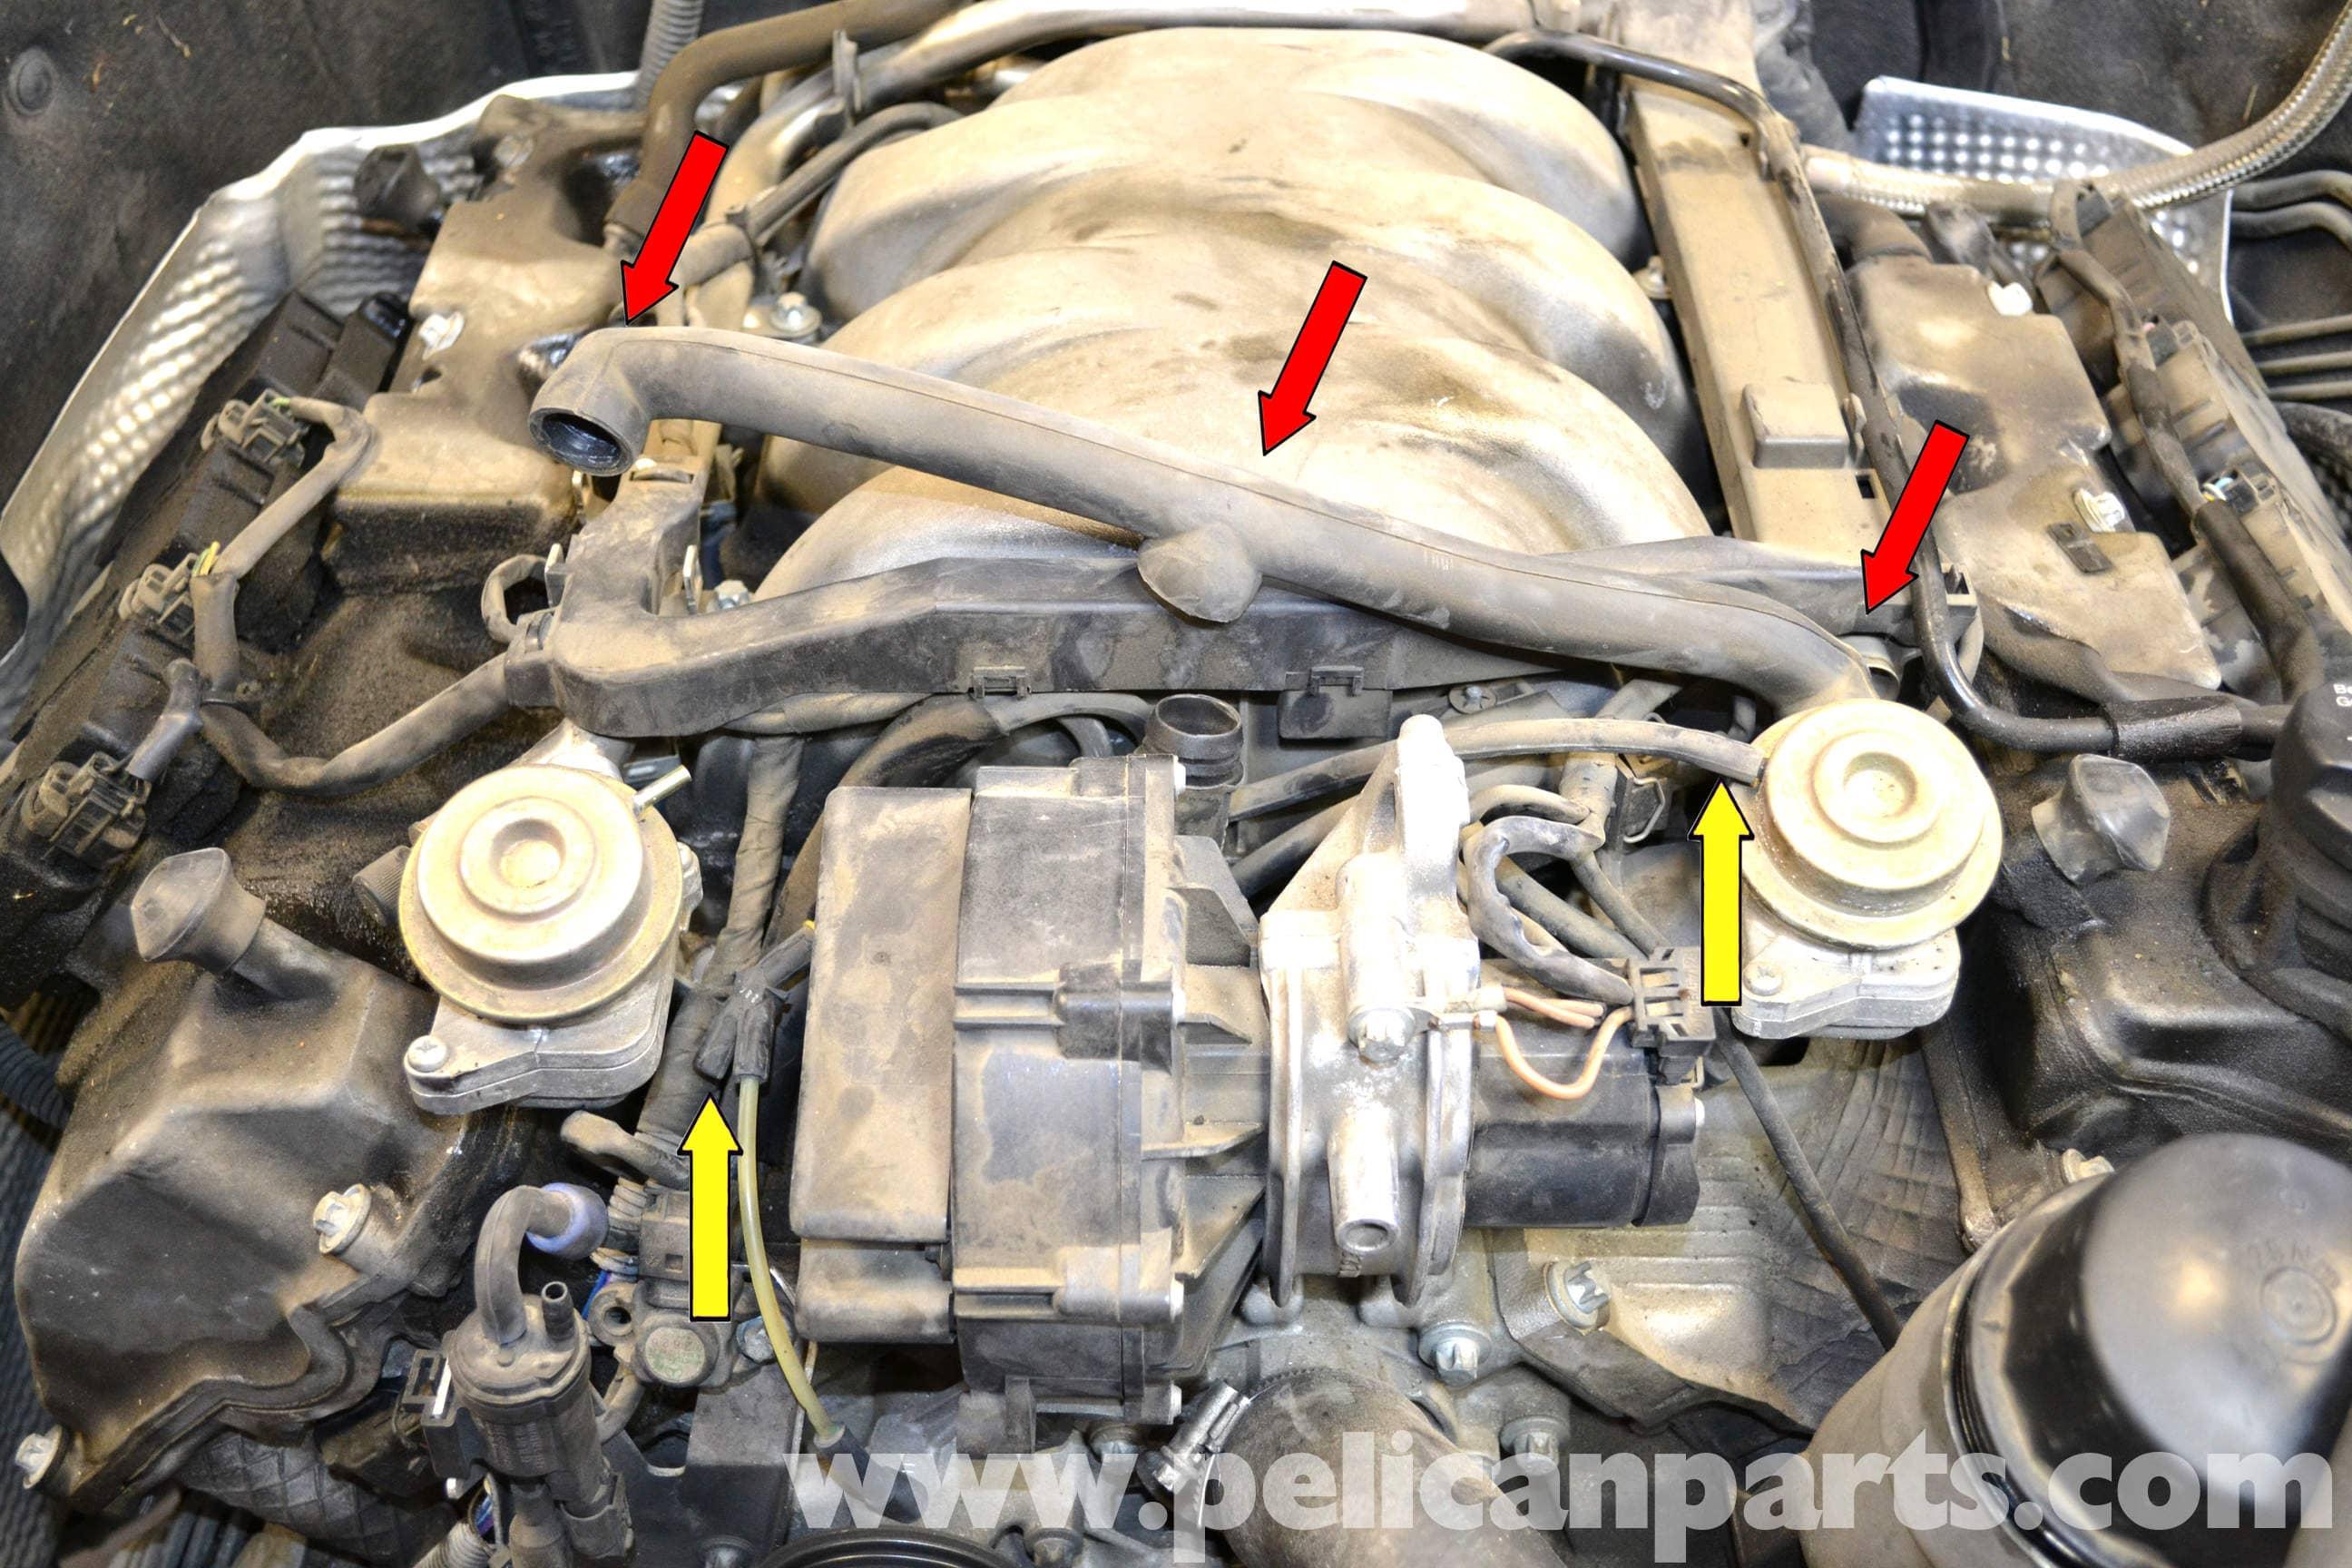 Mercedes-Benz C240 C280 Air Pump Check Valve Hose Check Valve to Check Valve